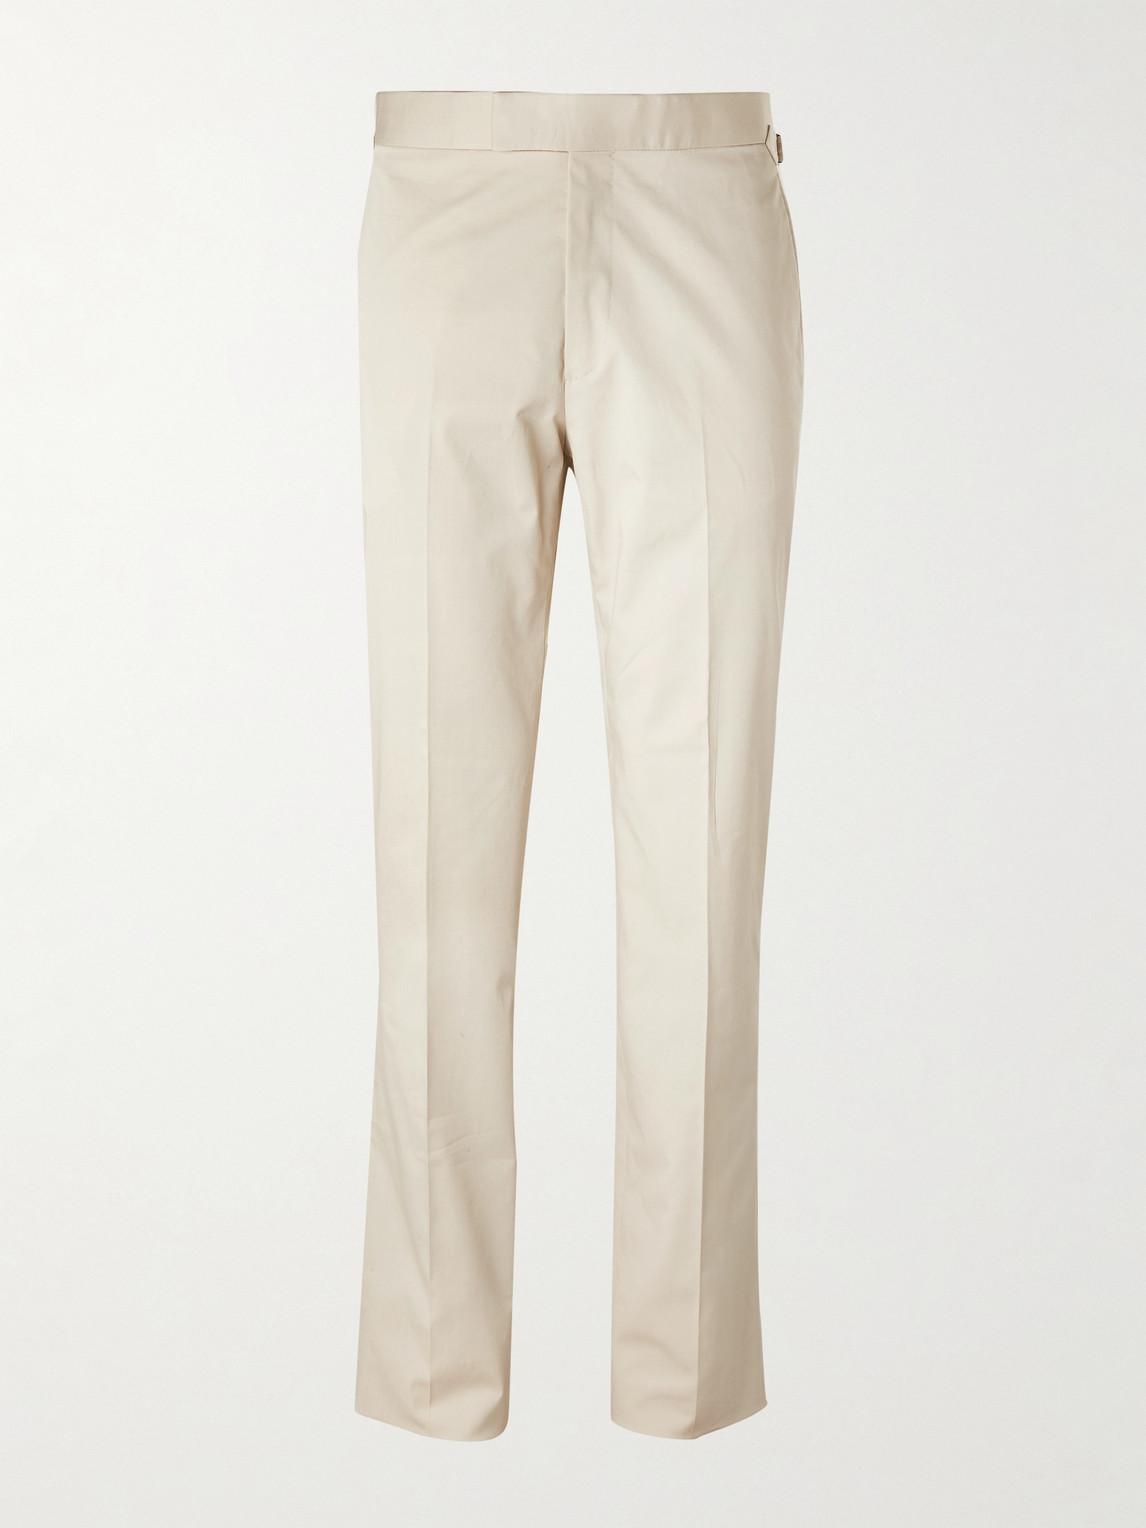 Kingsman Slim-fit Cotton-blend Twill Suit Trousers In Neutrals